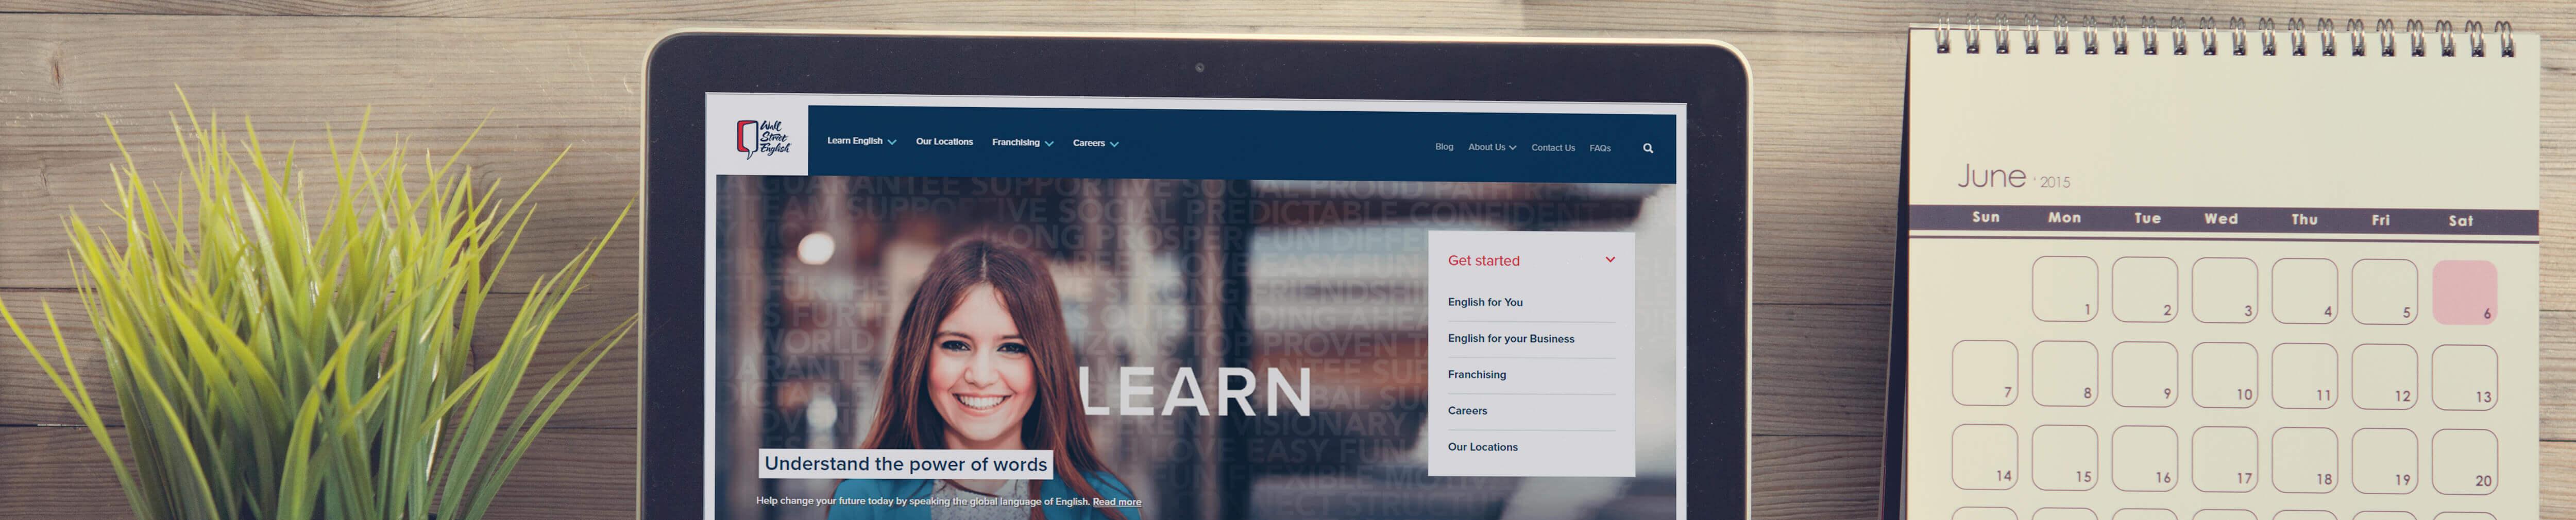 Mockup of Wall Street Russian website